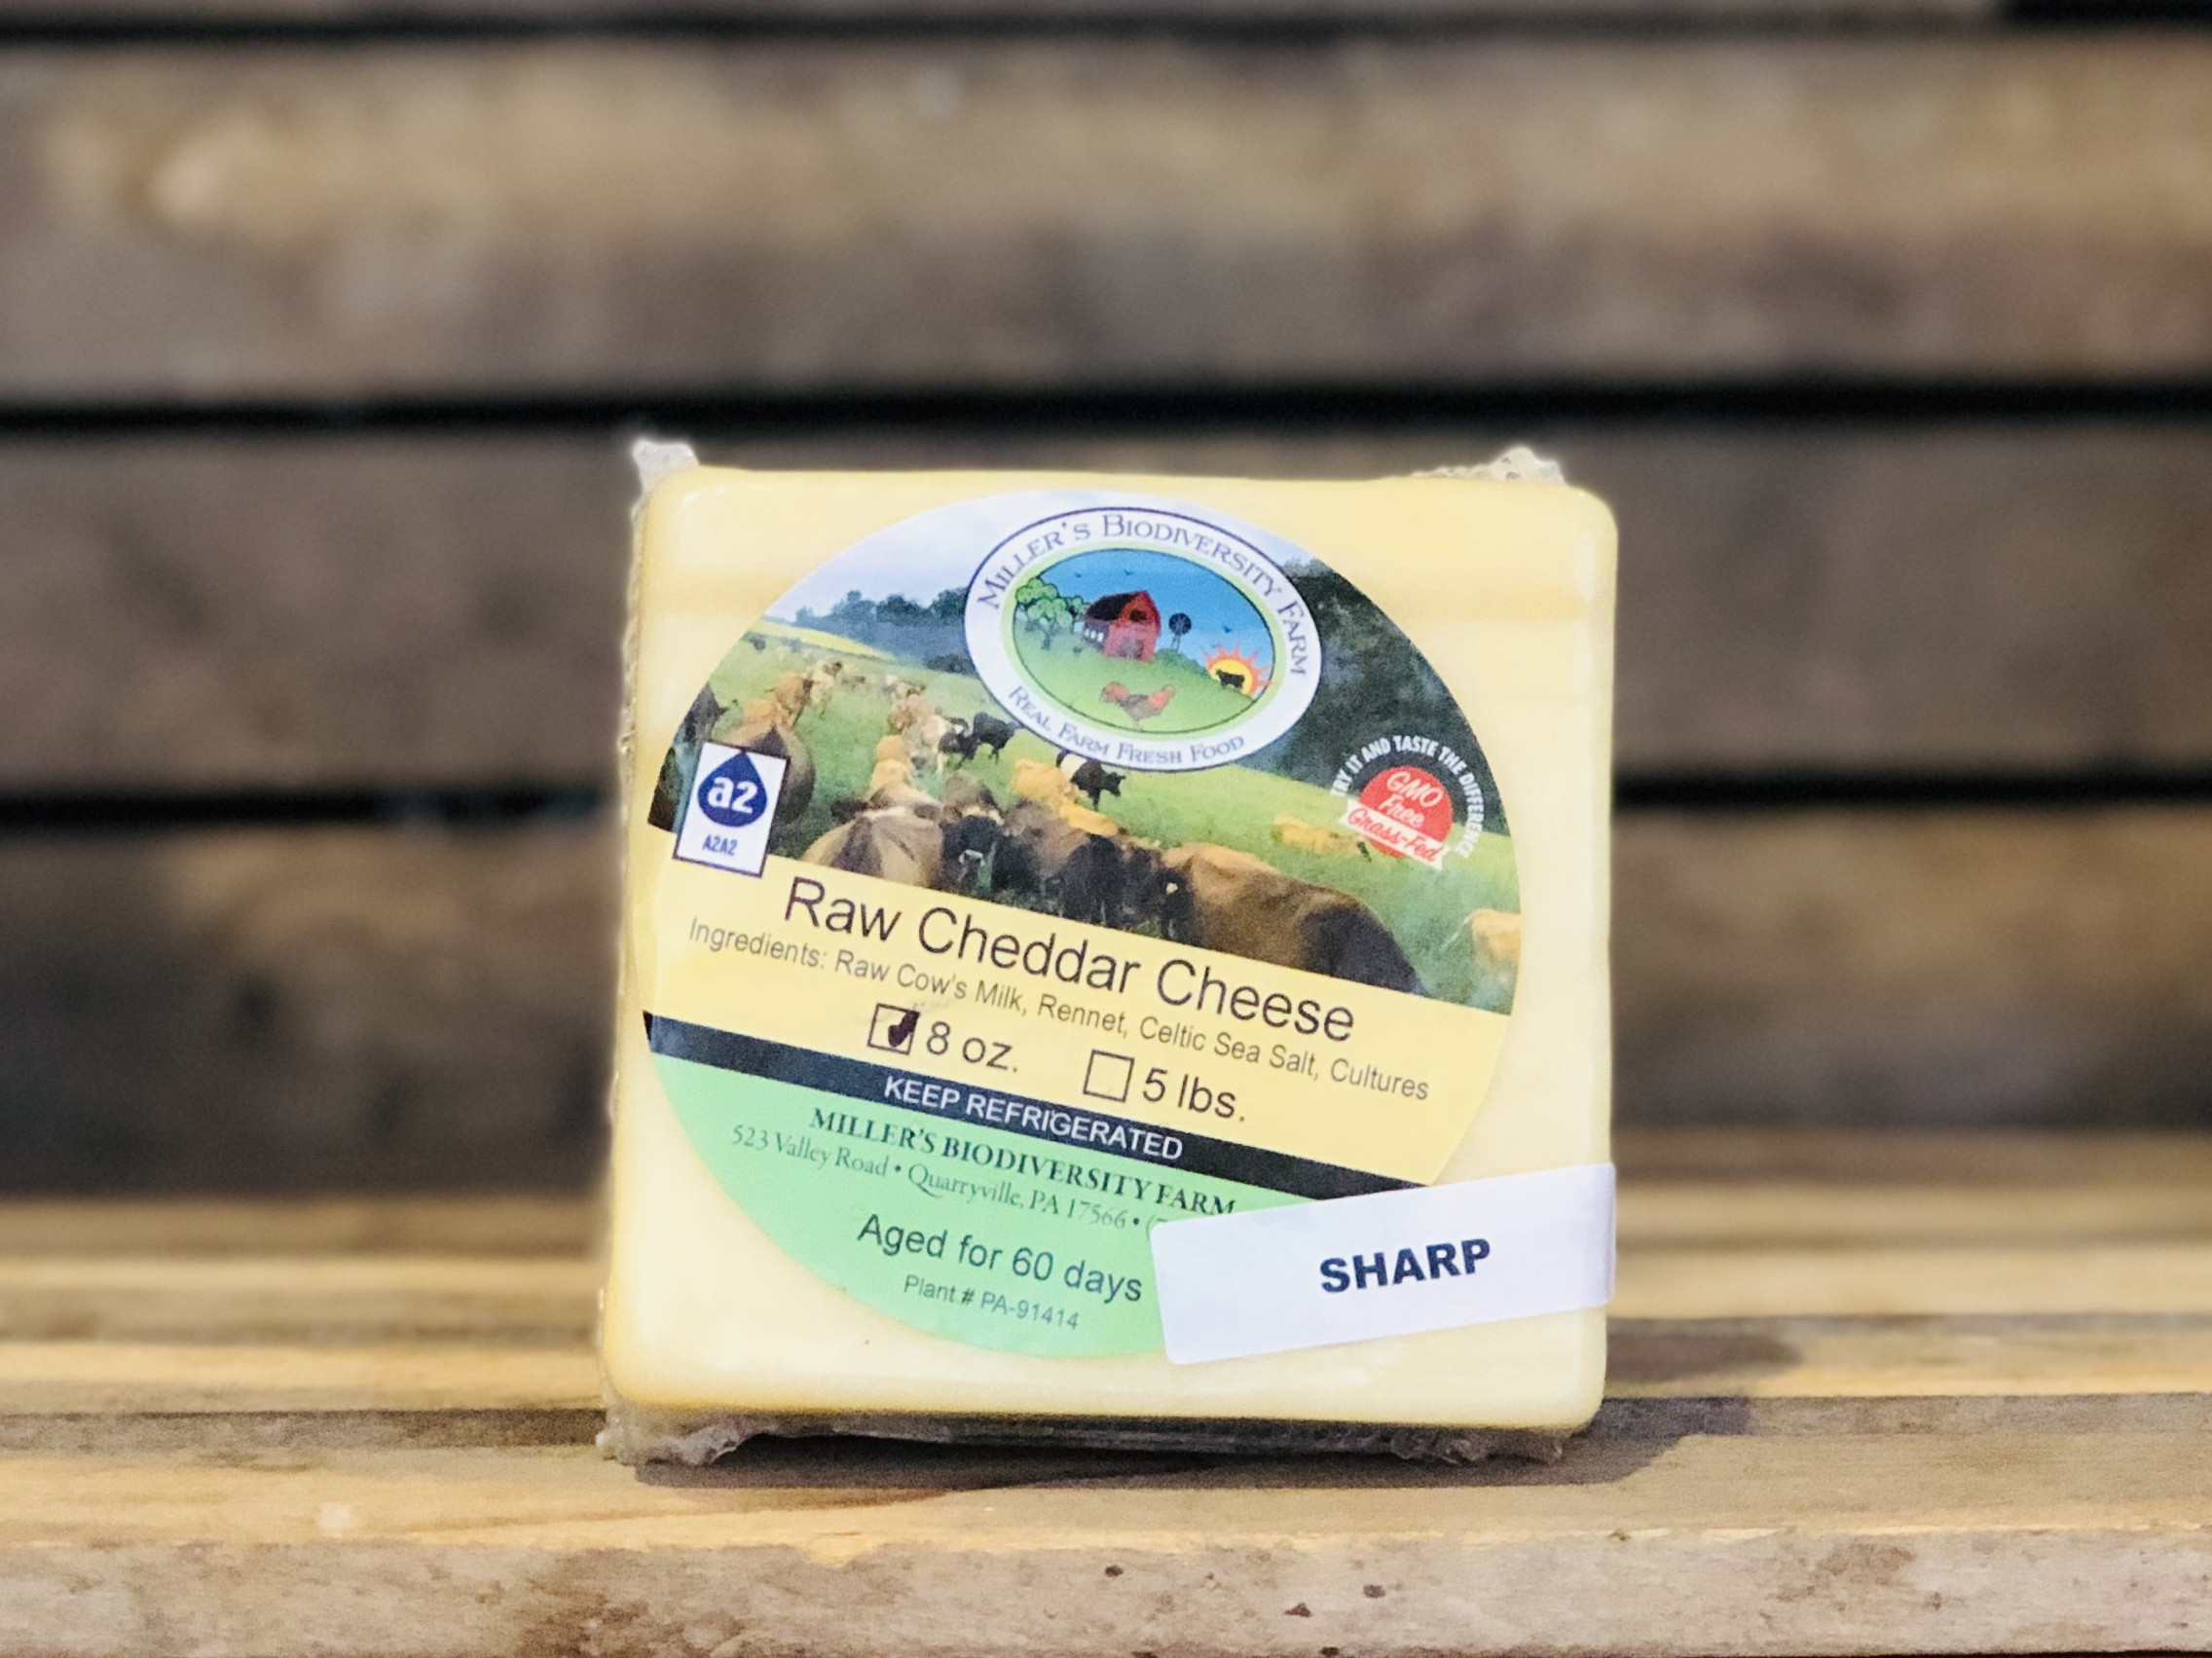 Sharp A2 Cheddar Cheese, 8oz - Miller's Biodiversity Farm